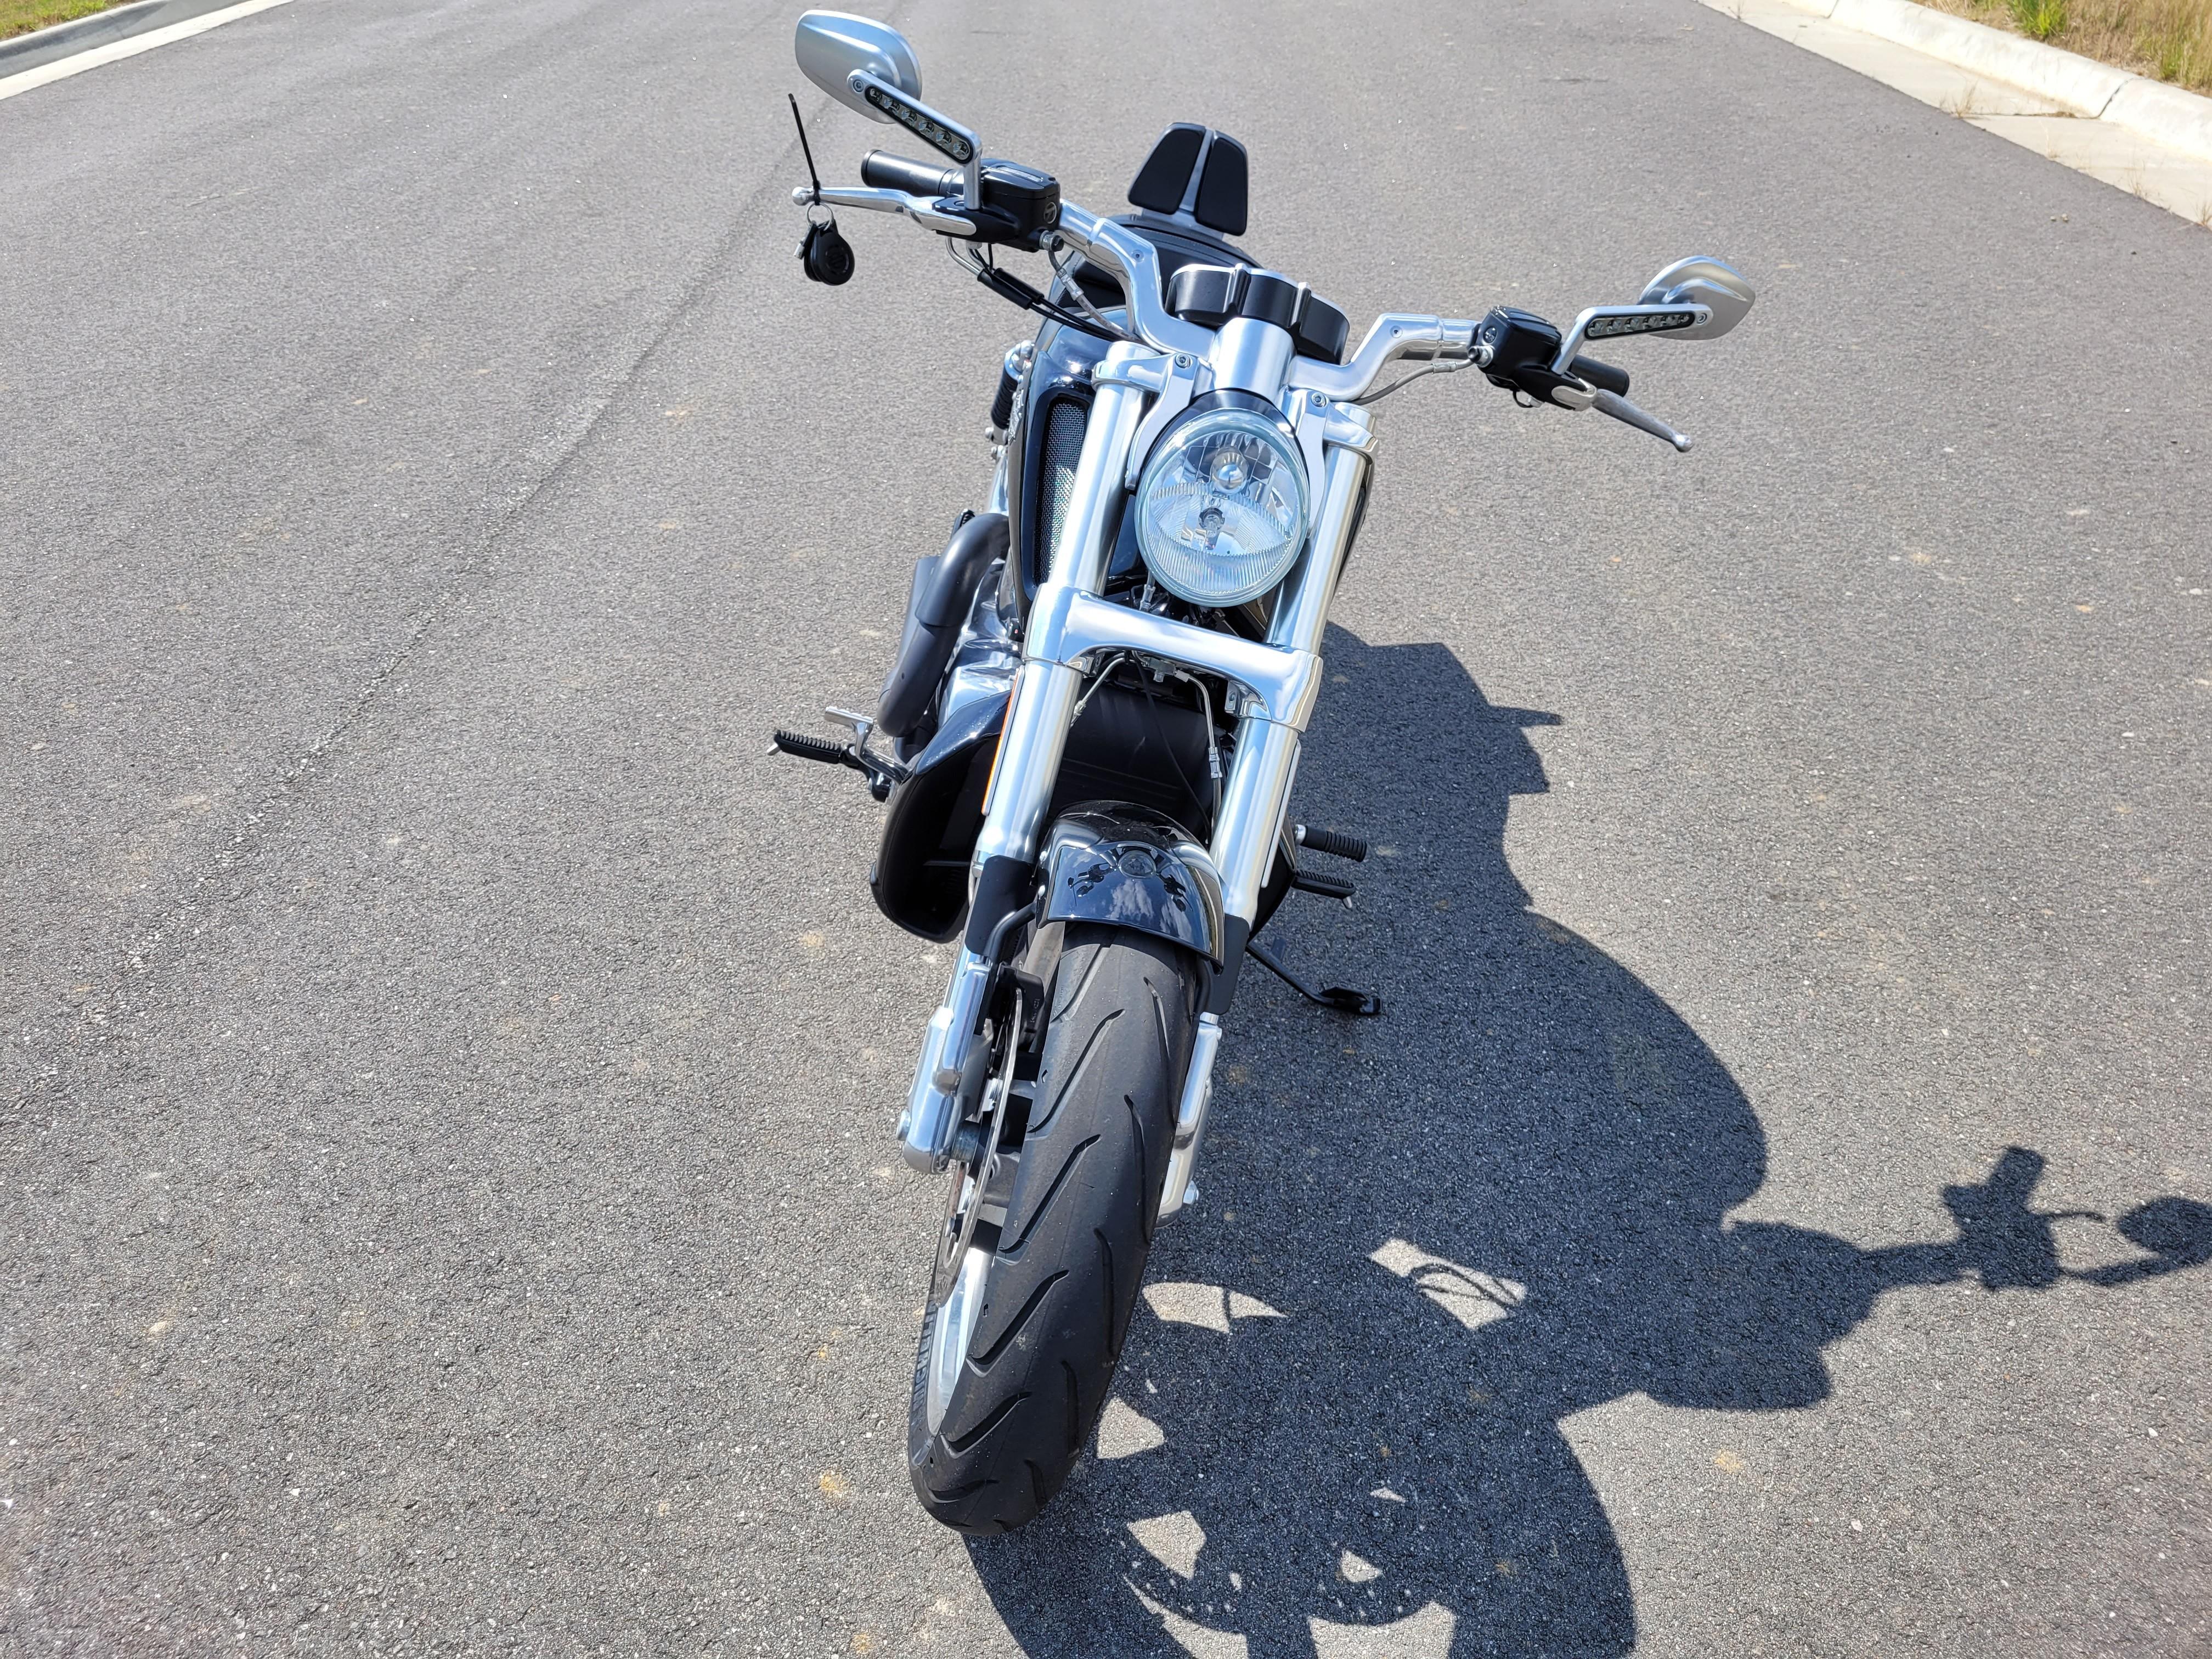 2014 Harley-Davidson V-Rod V-Rod Muscle at Richmond Harley-Davidson